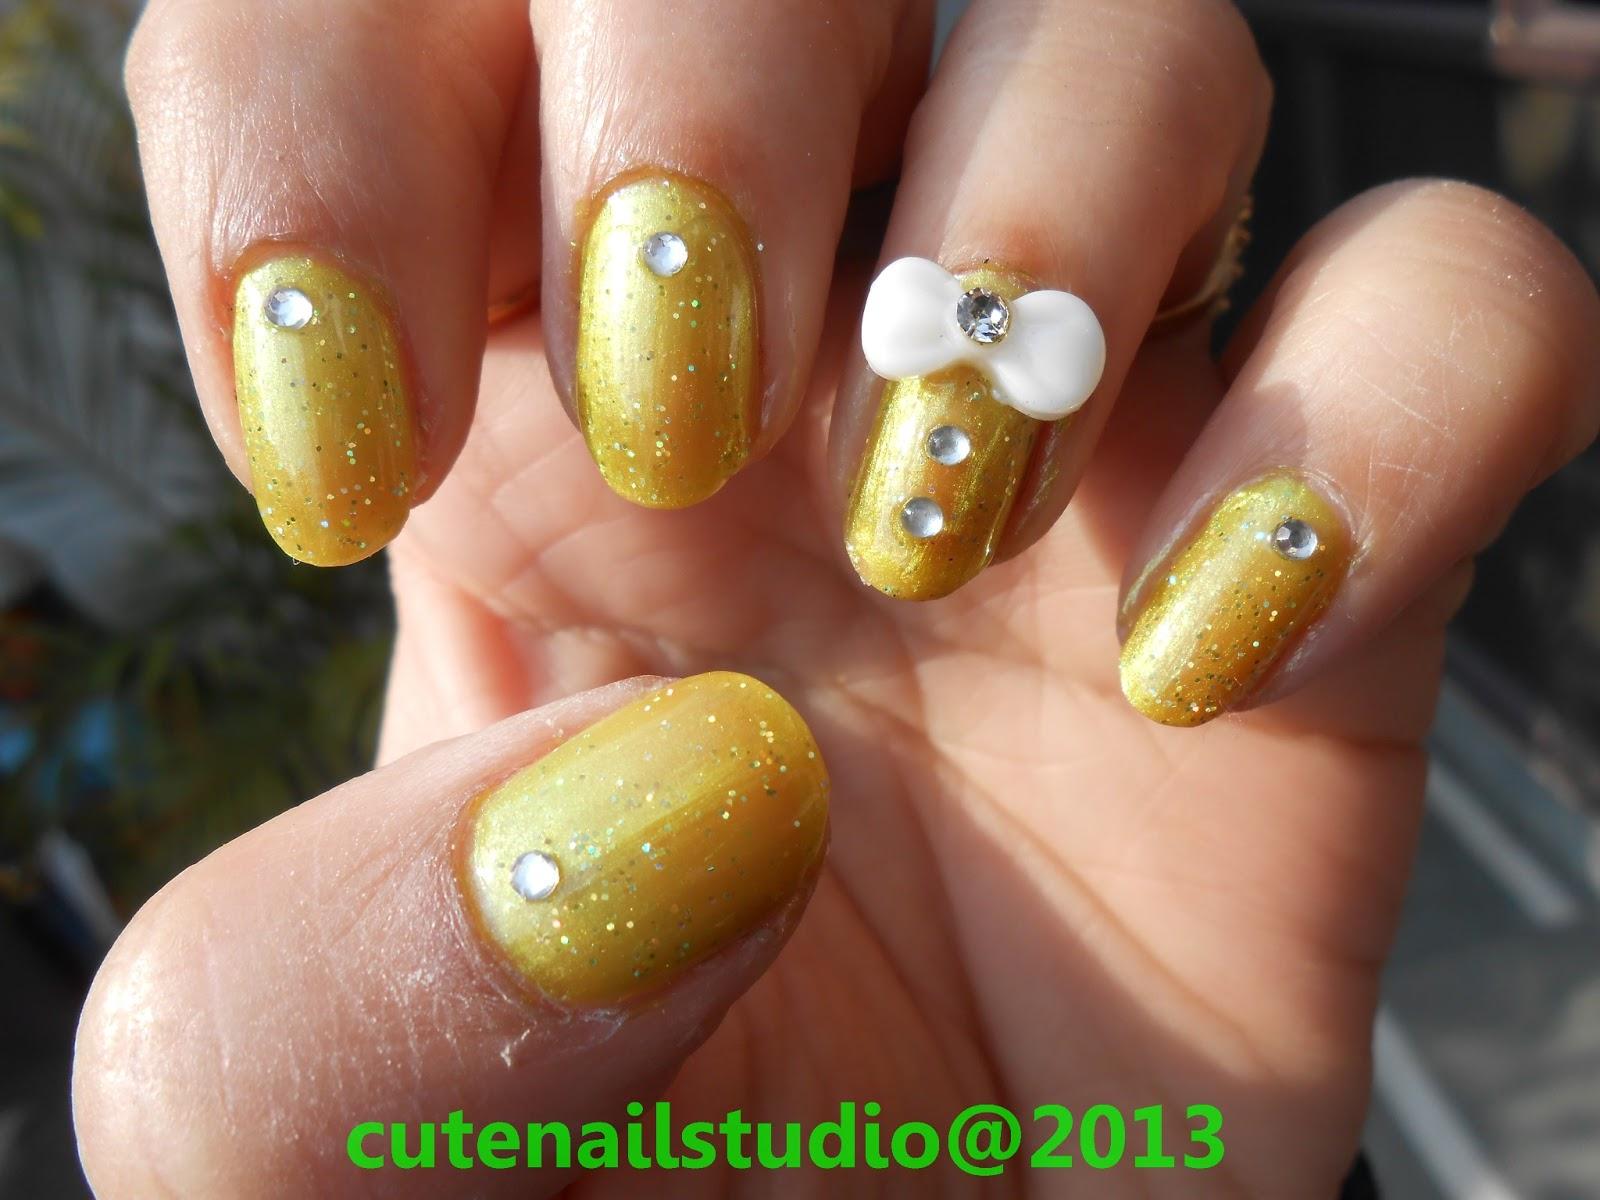 Cute nails: 3D bow nail art.